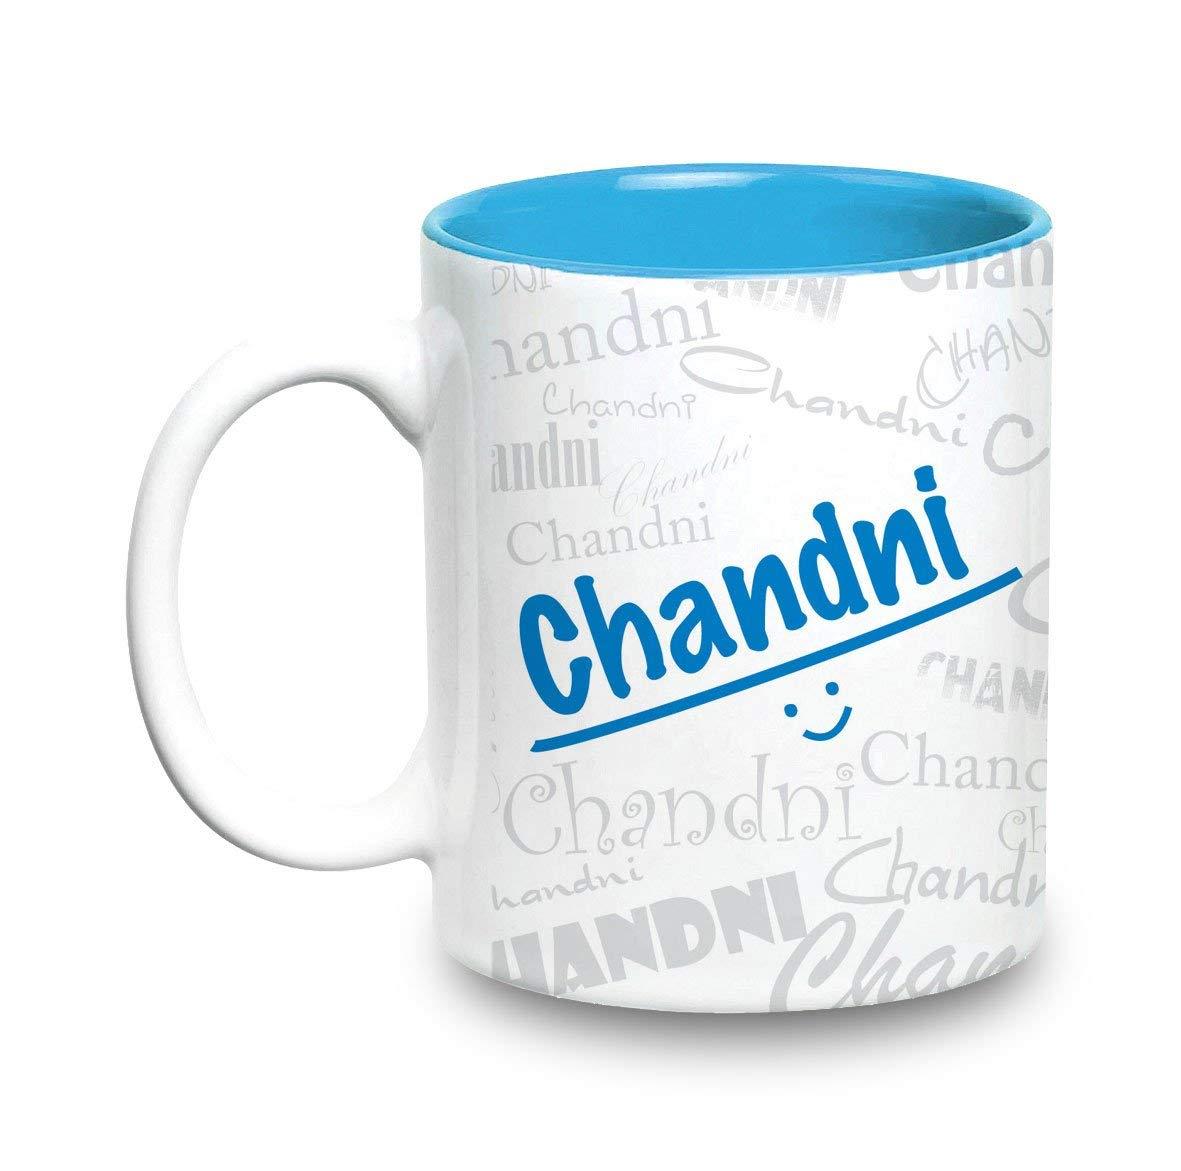 Buy Hot Muggs Me Graffiti Mug Chandni Personalised Name Ceramic 315ml 1 Unit Online At Low Prices In India Amazon In